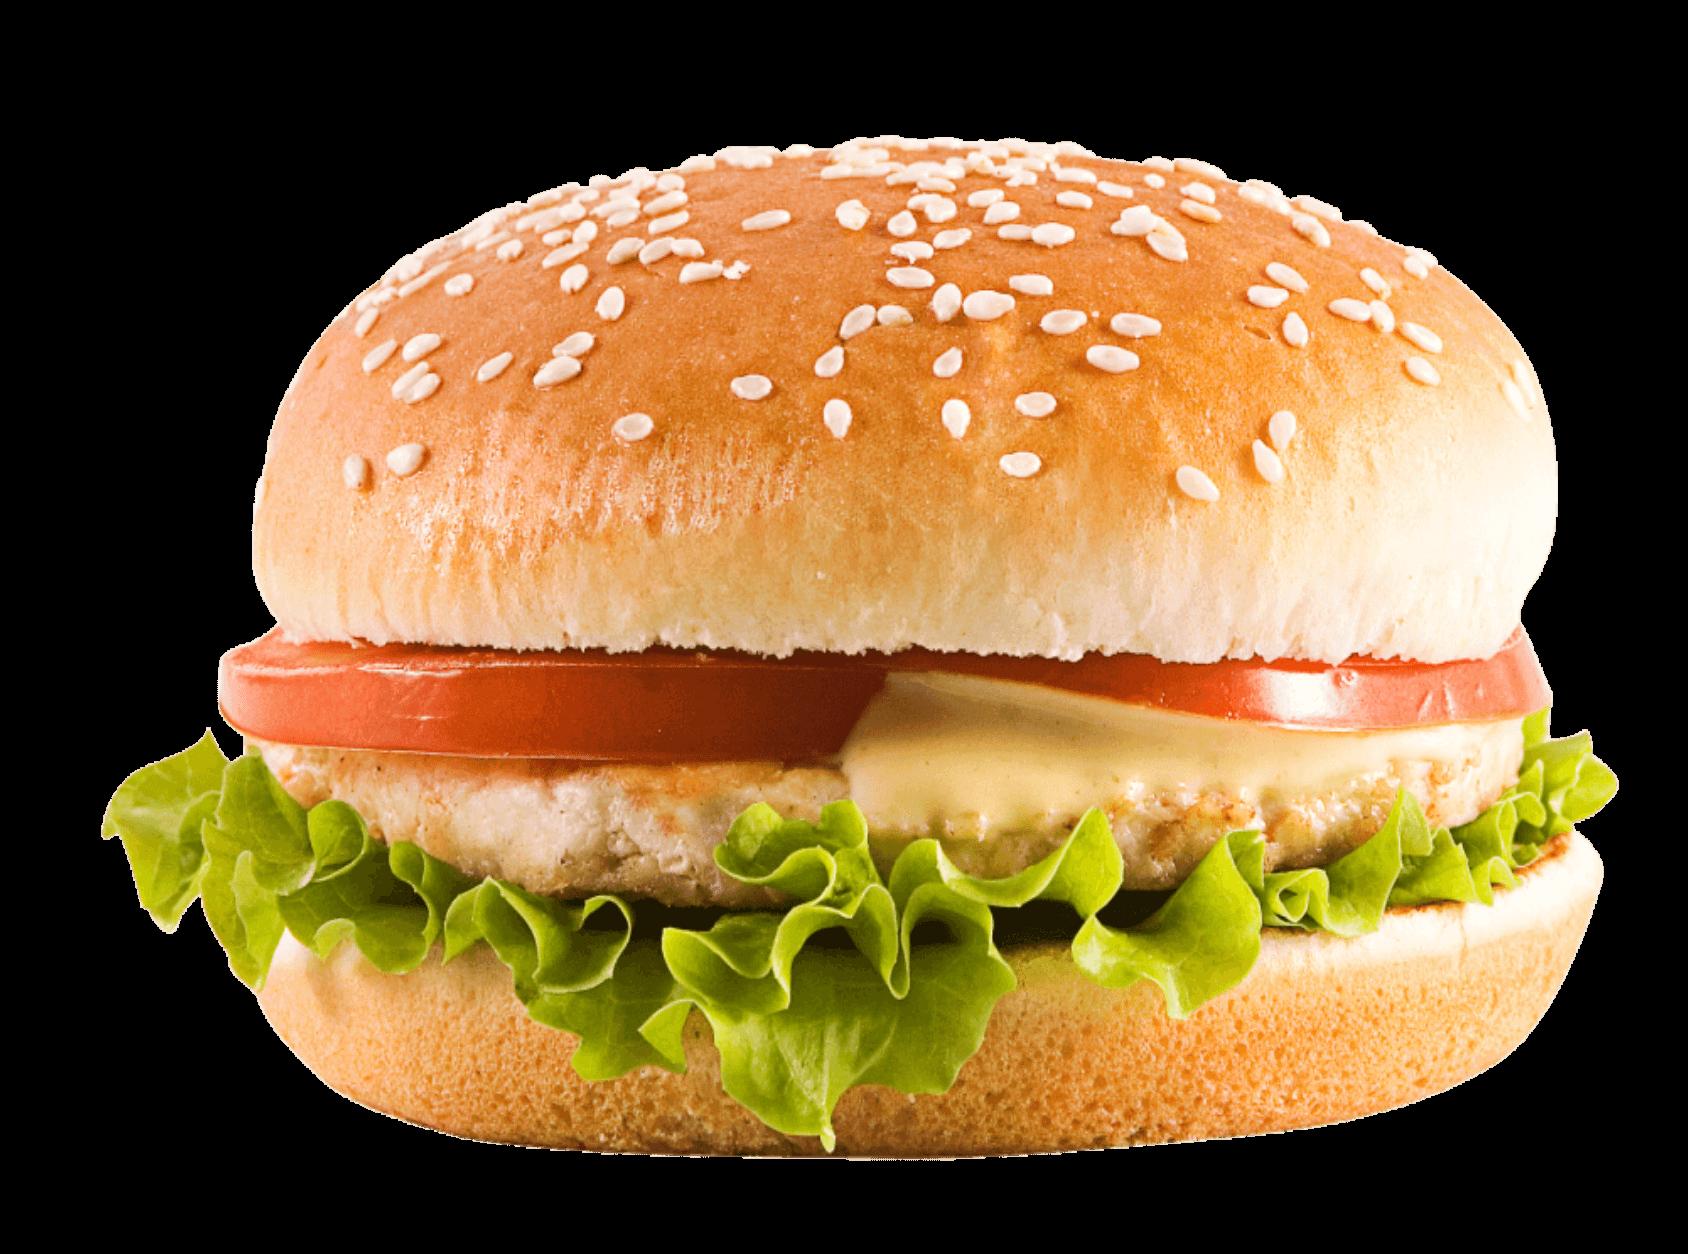 Hamburger Burger Png Image PNG Image - Burger Sandwich PNG - Sandwich PNG HD